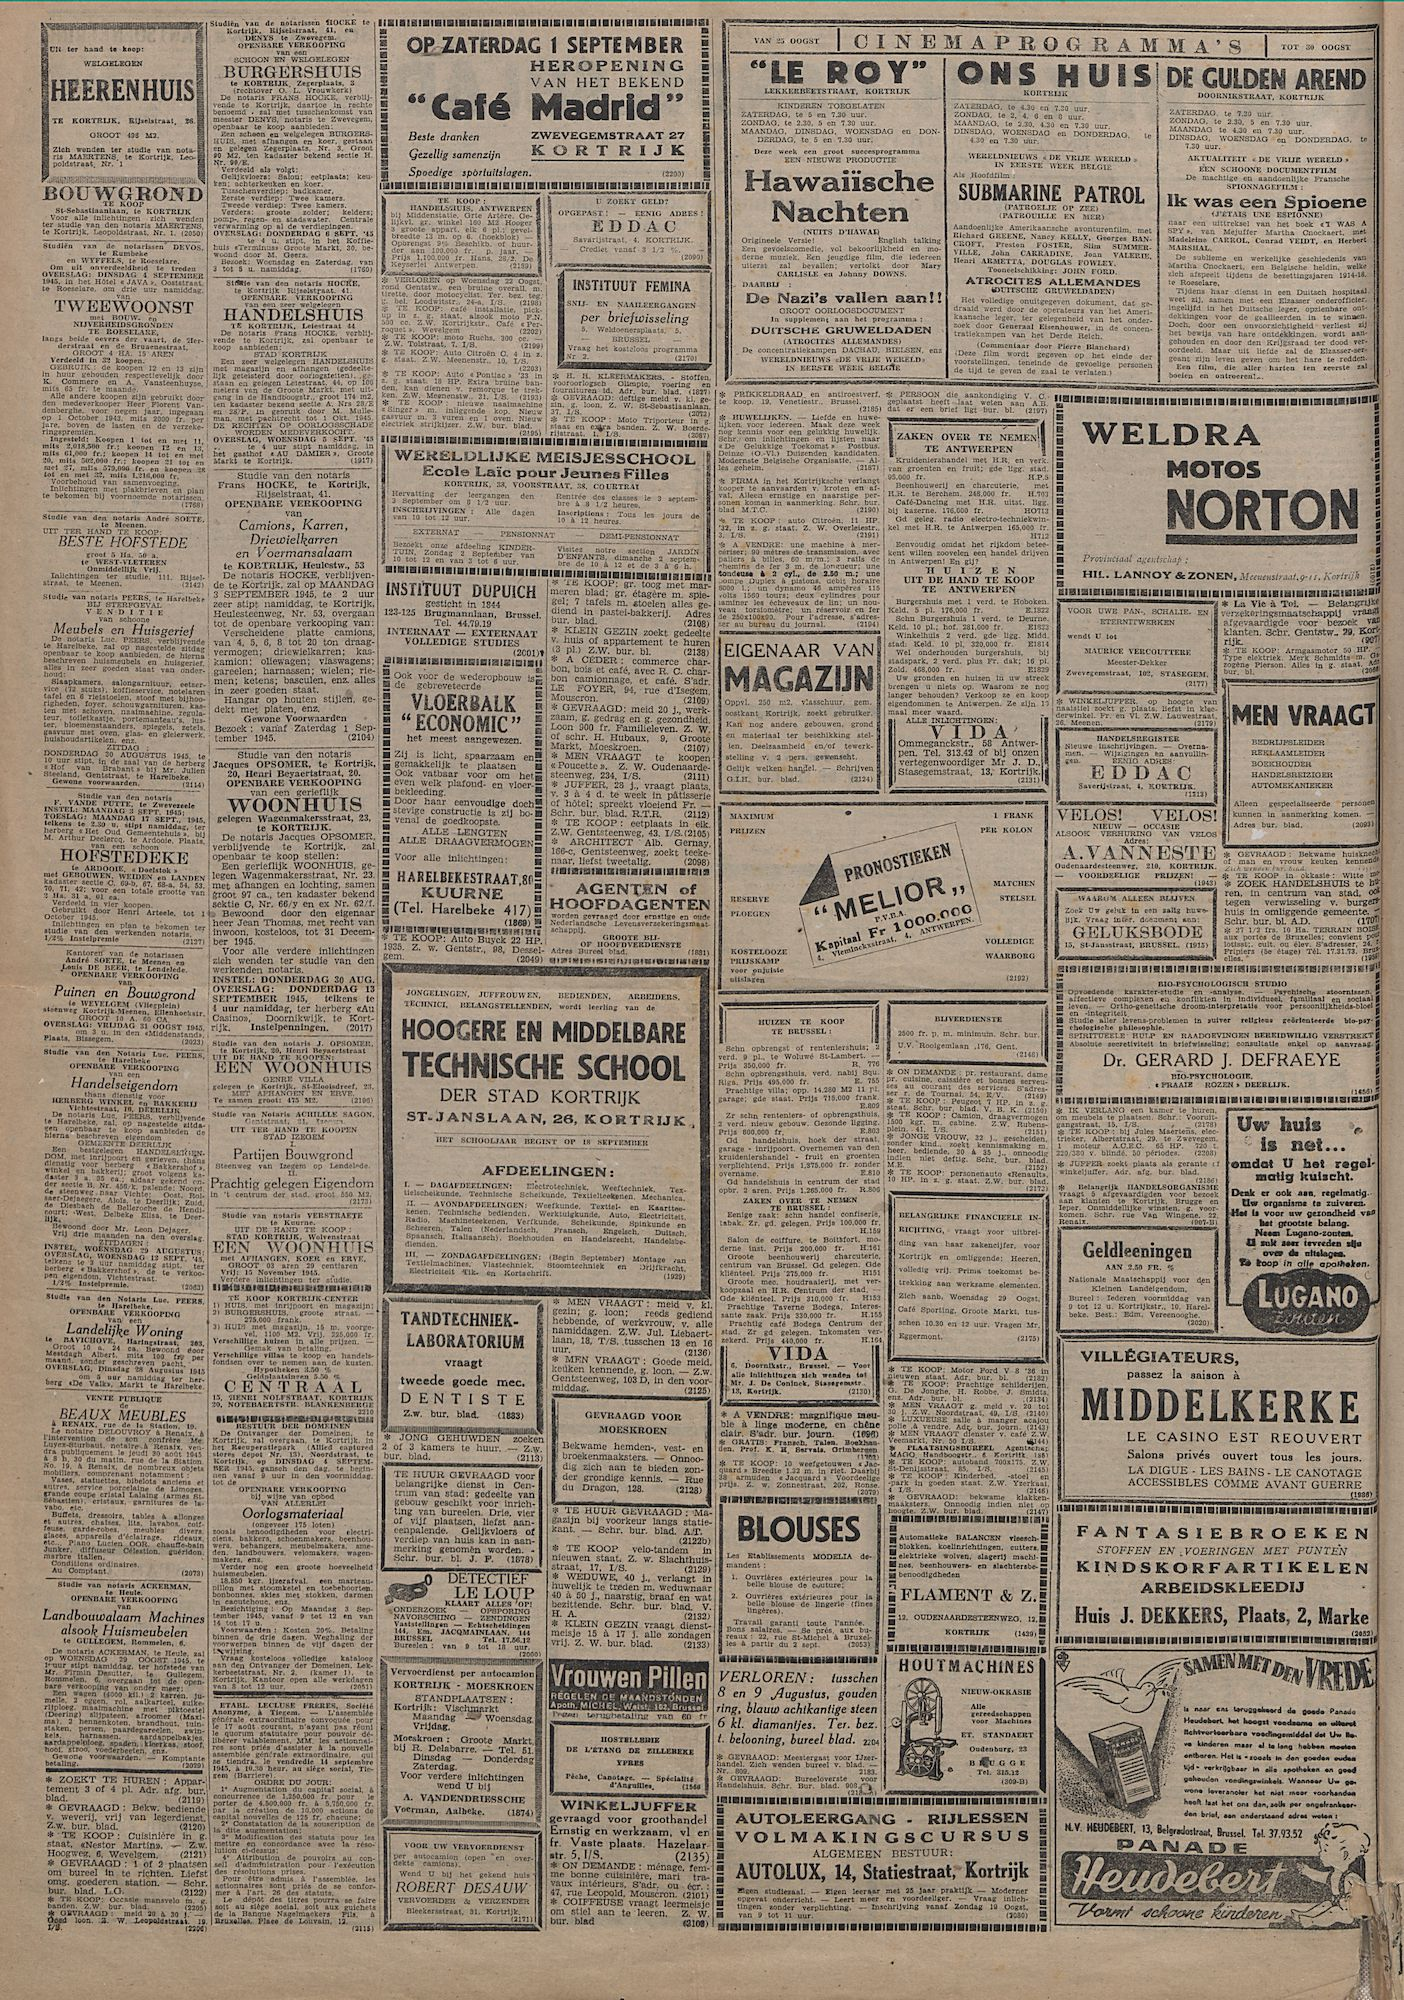 Kortrijksch Handelsblad 25 augustus 1945 Nr68 p2